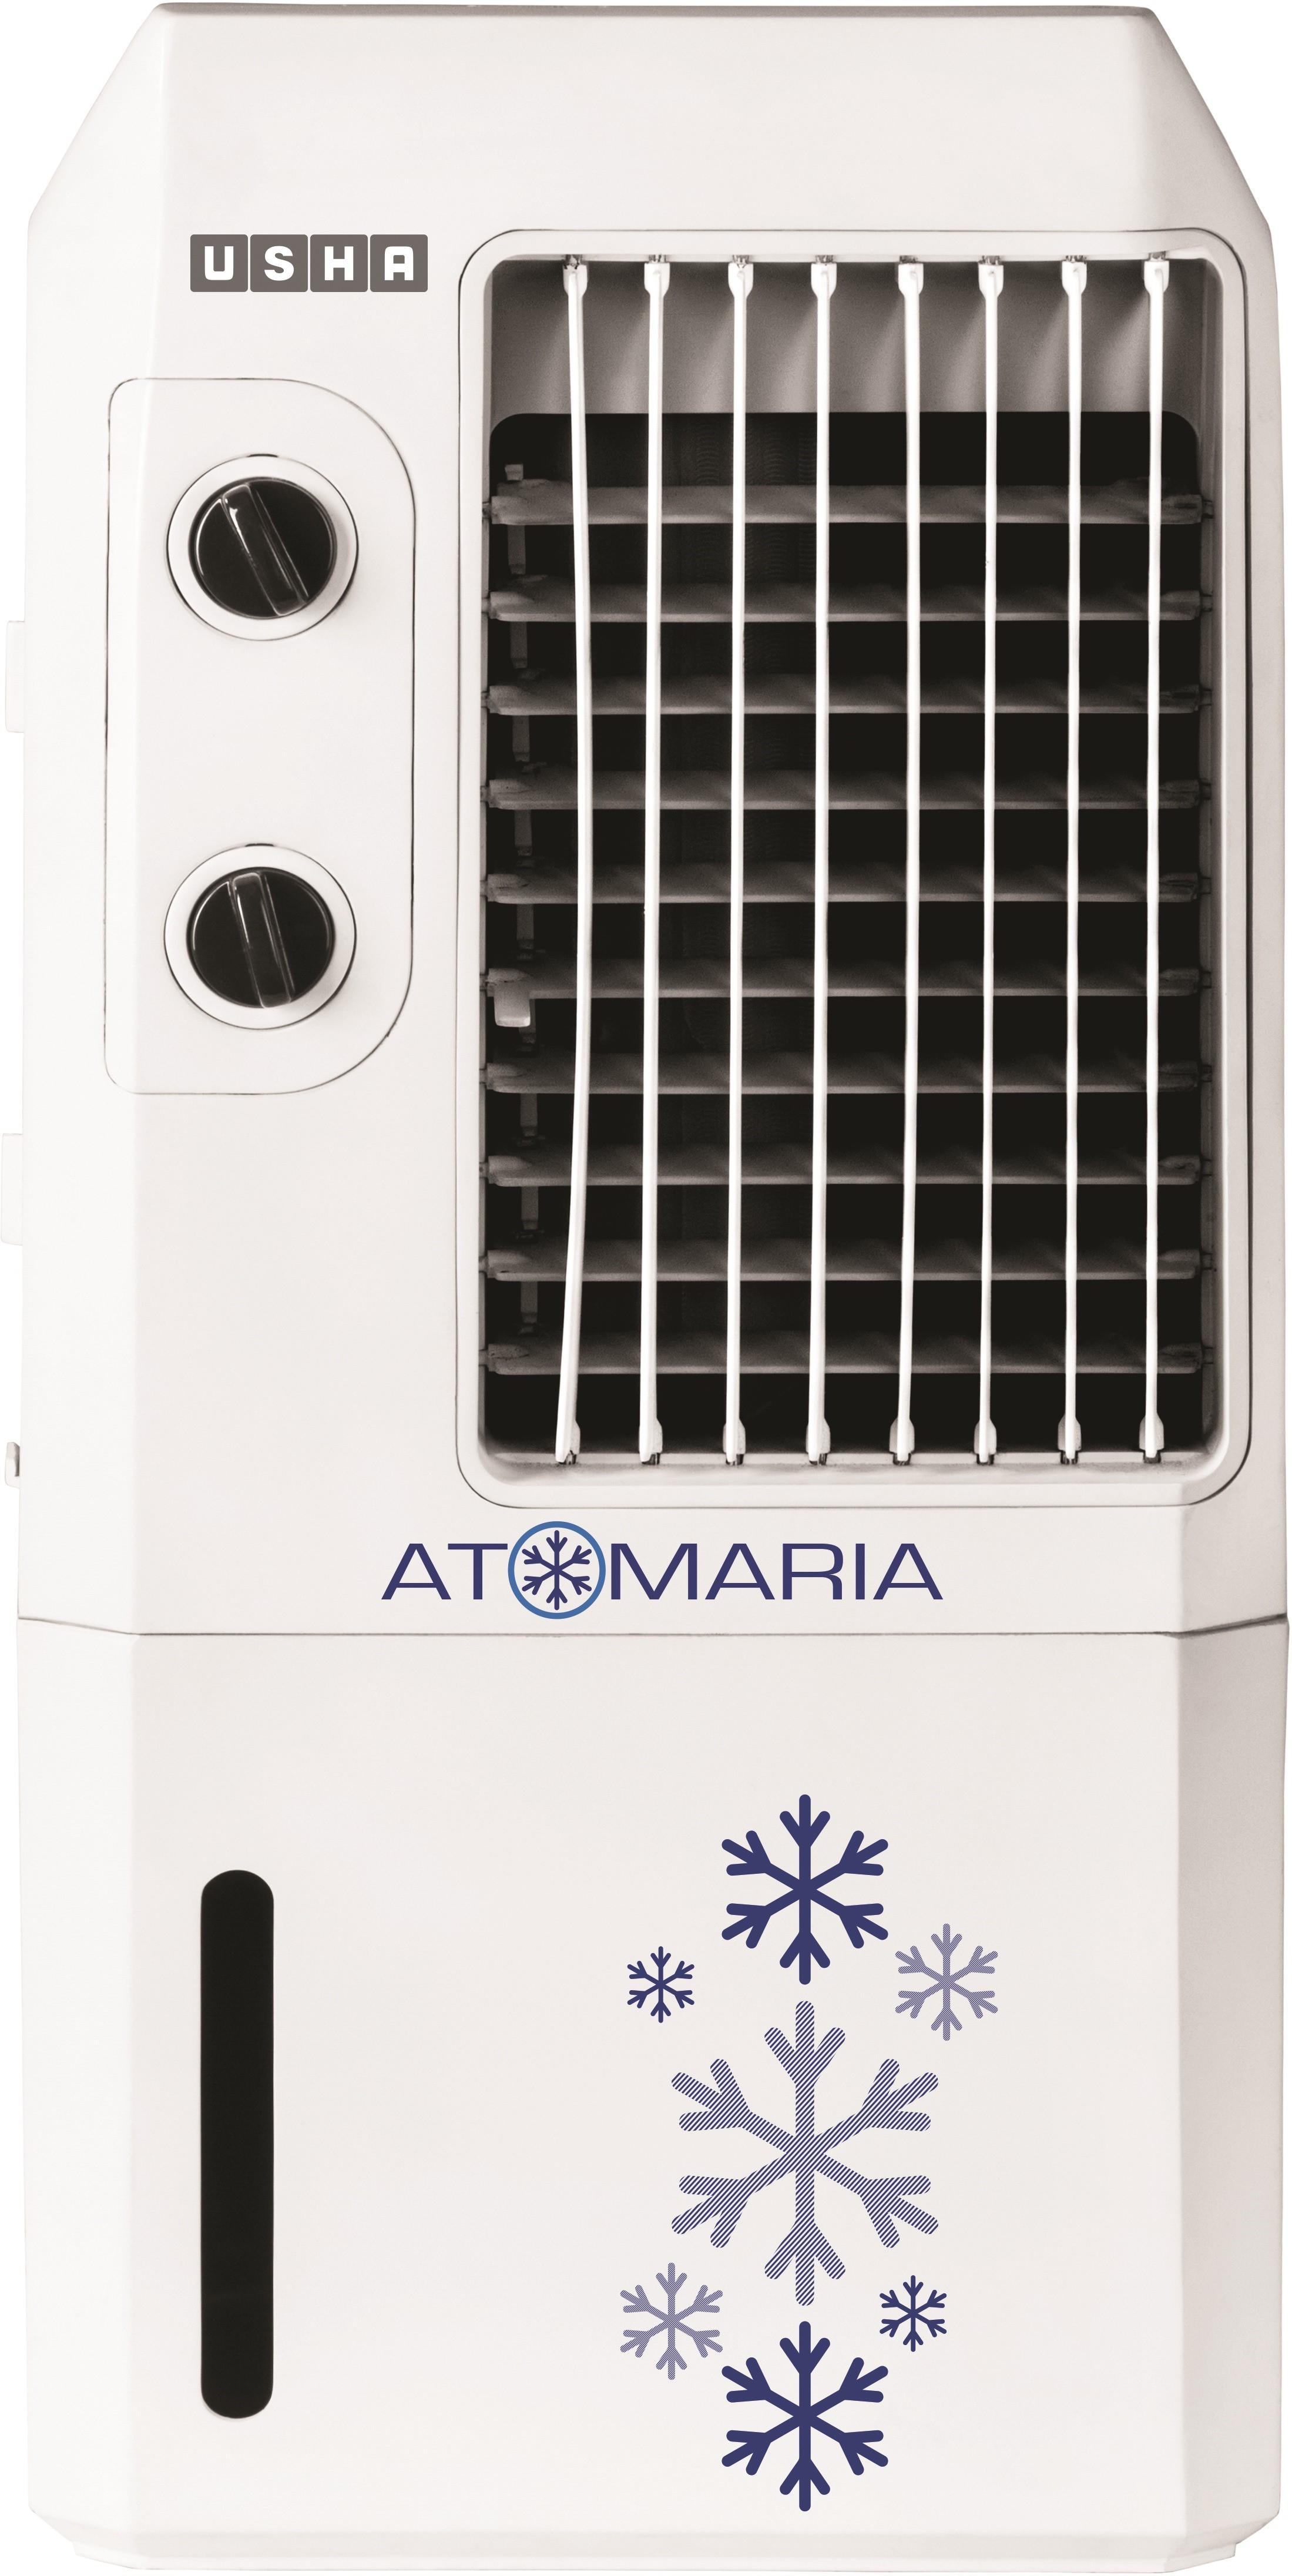 Usha Atomaria Personal Air Cooler Image